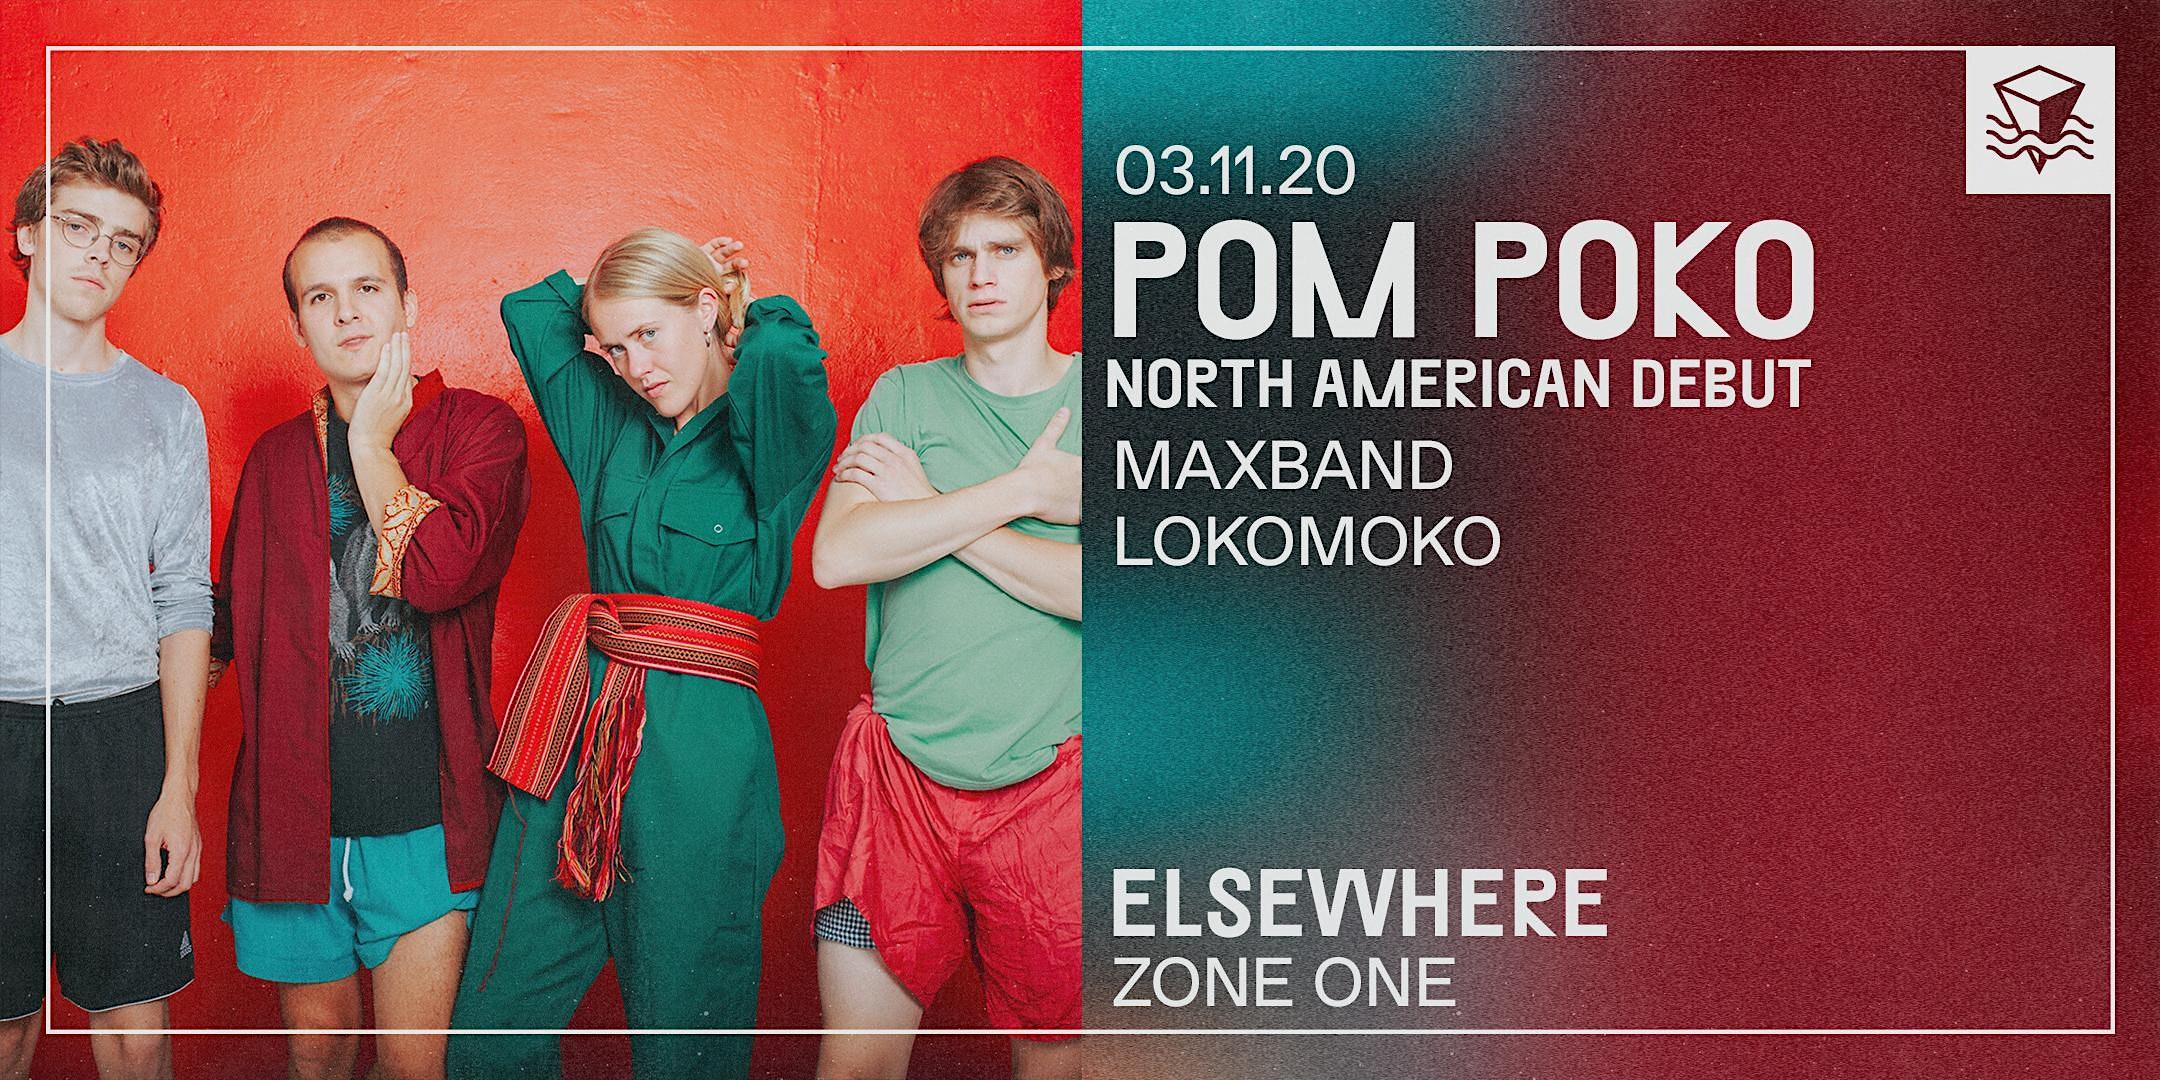 Pom Poko (North American Debut!)